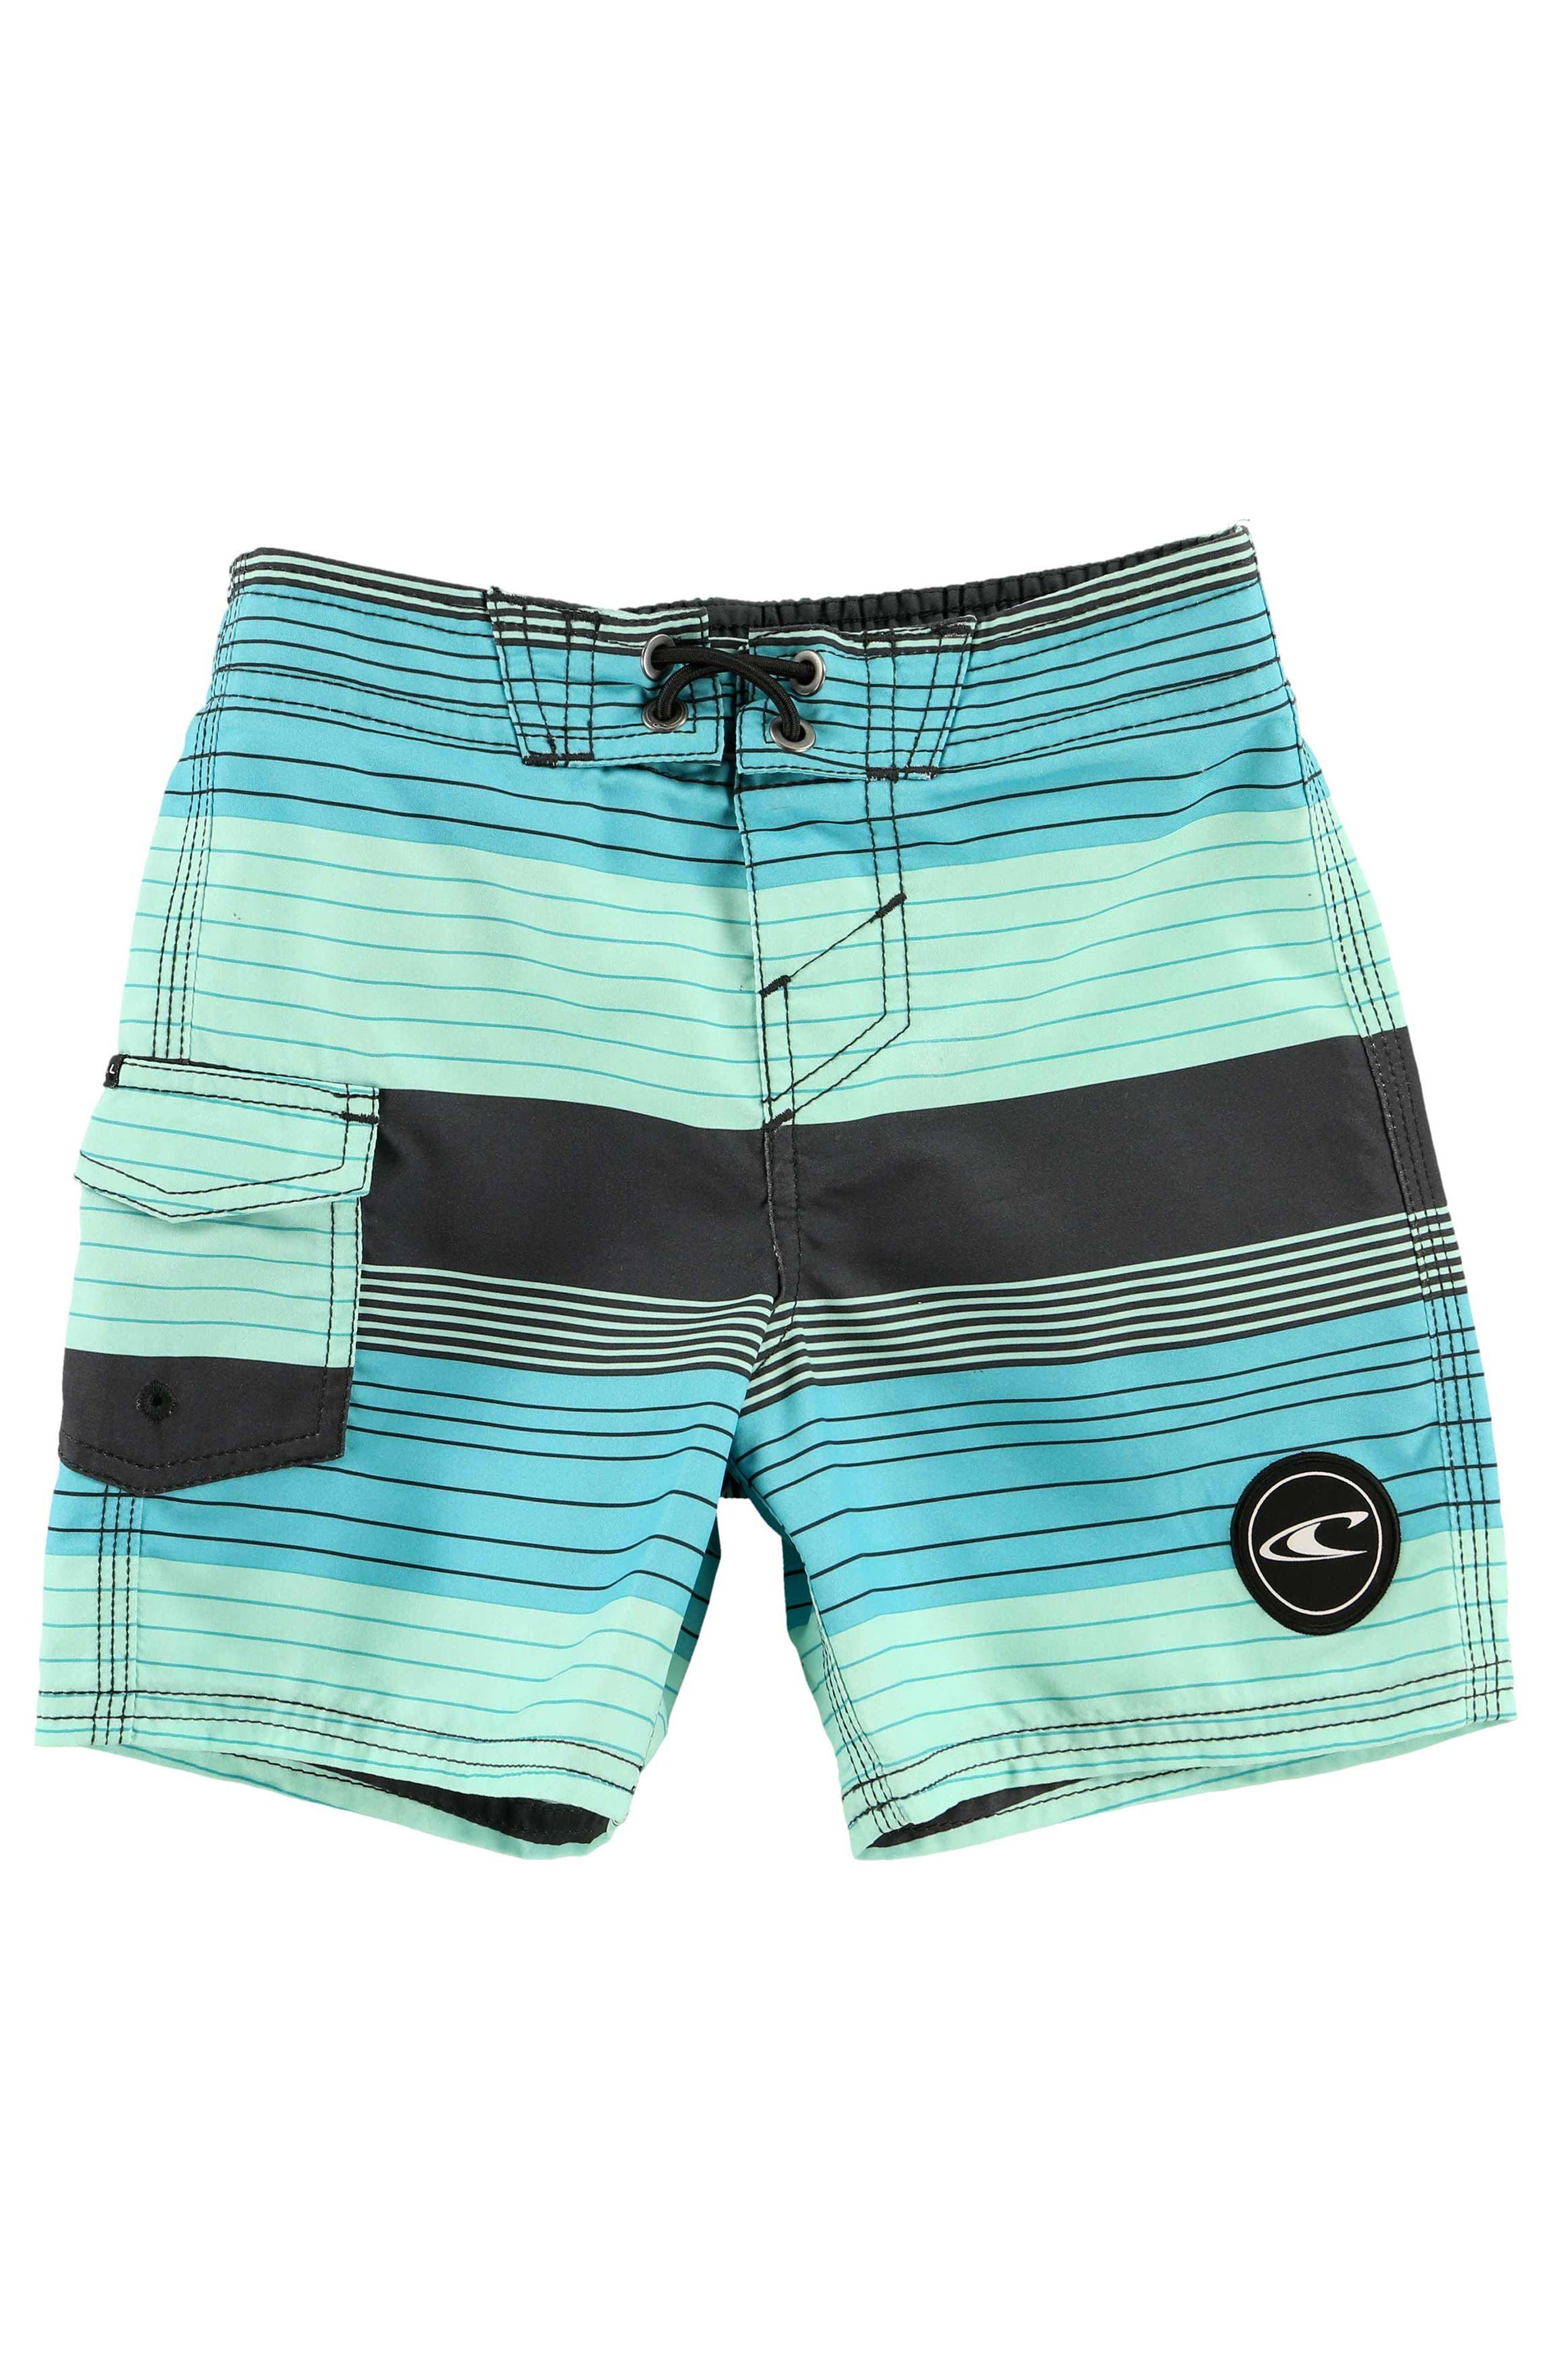 Alternate Image 1 Selected - O'Neill Santa Cruz Stripe Board Shorts (Toddler Boys)